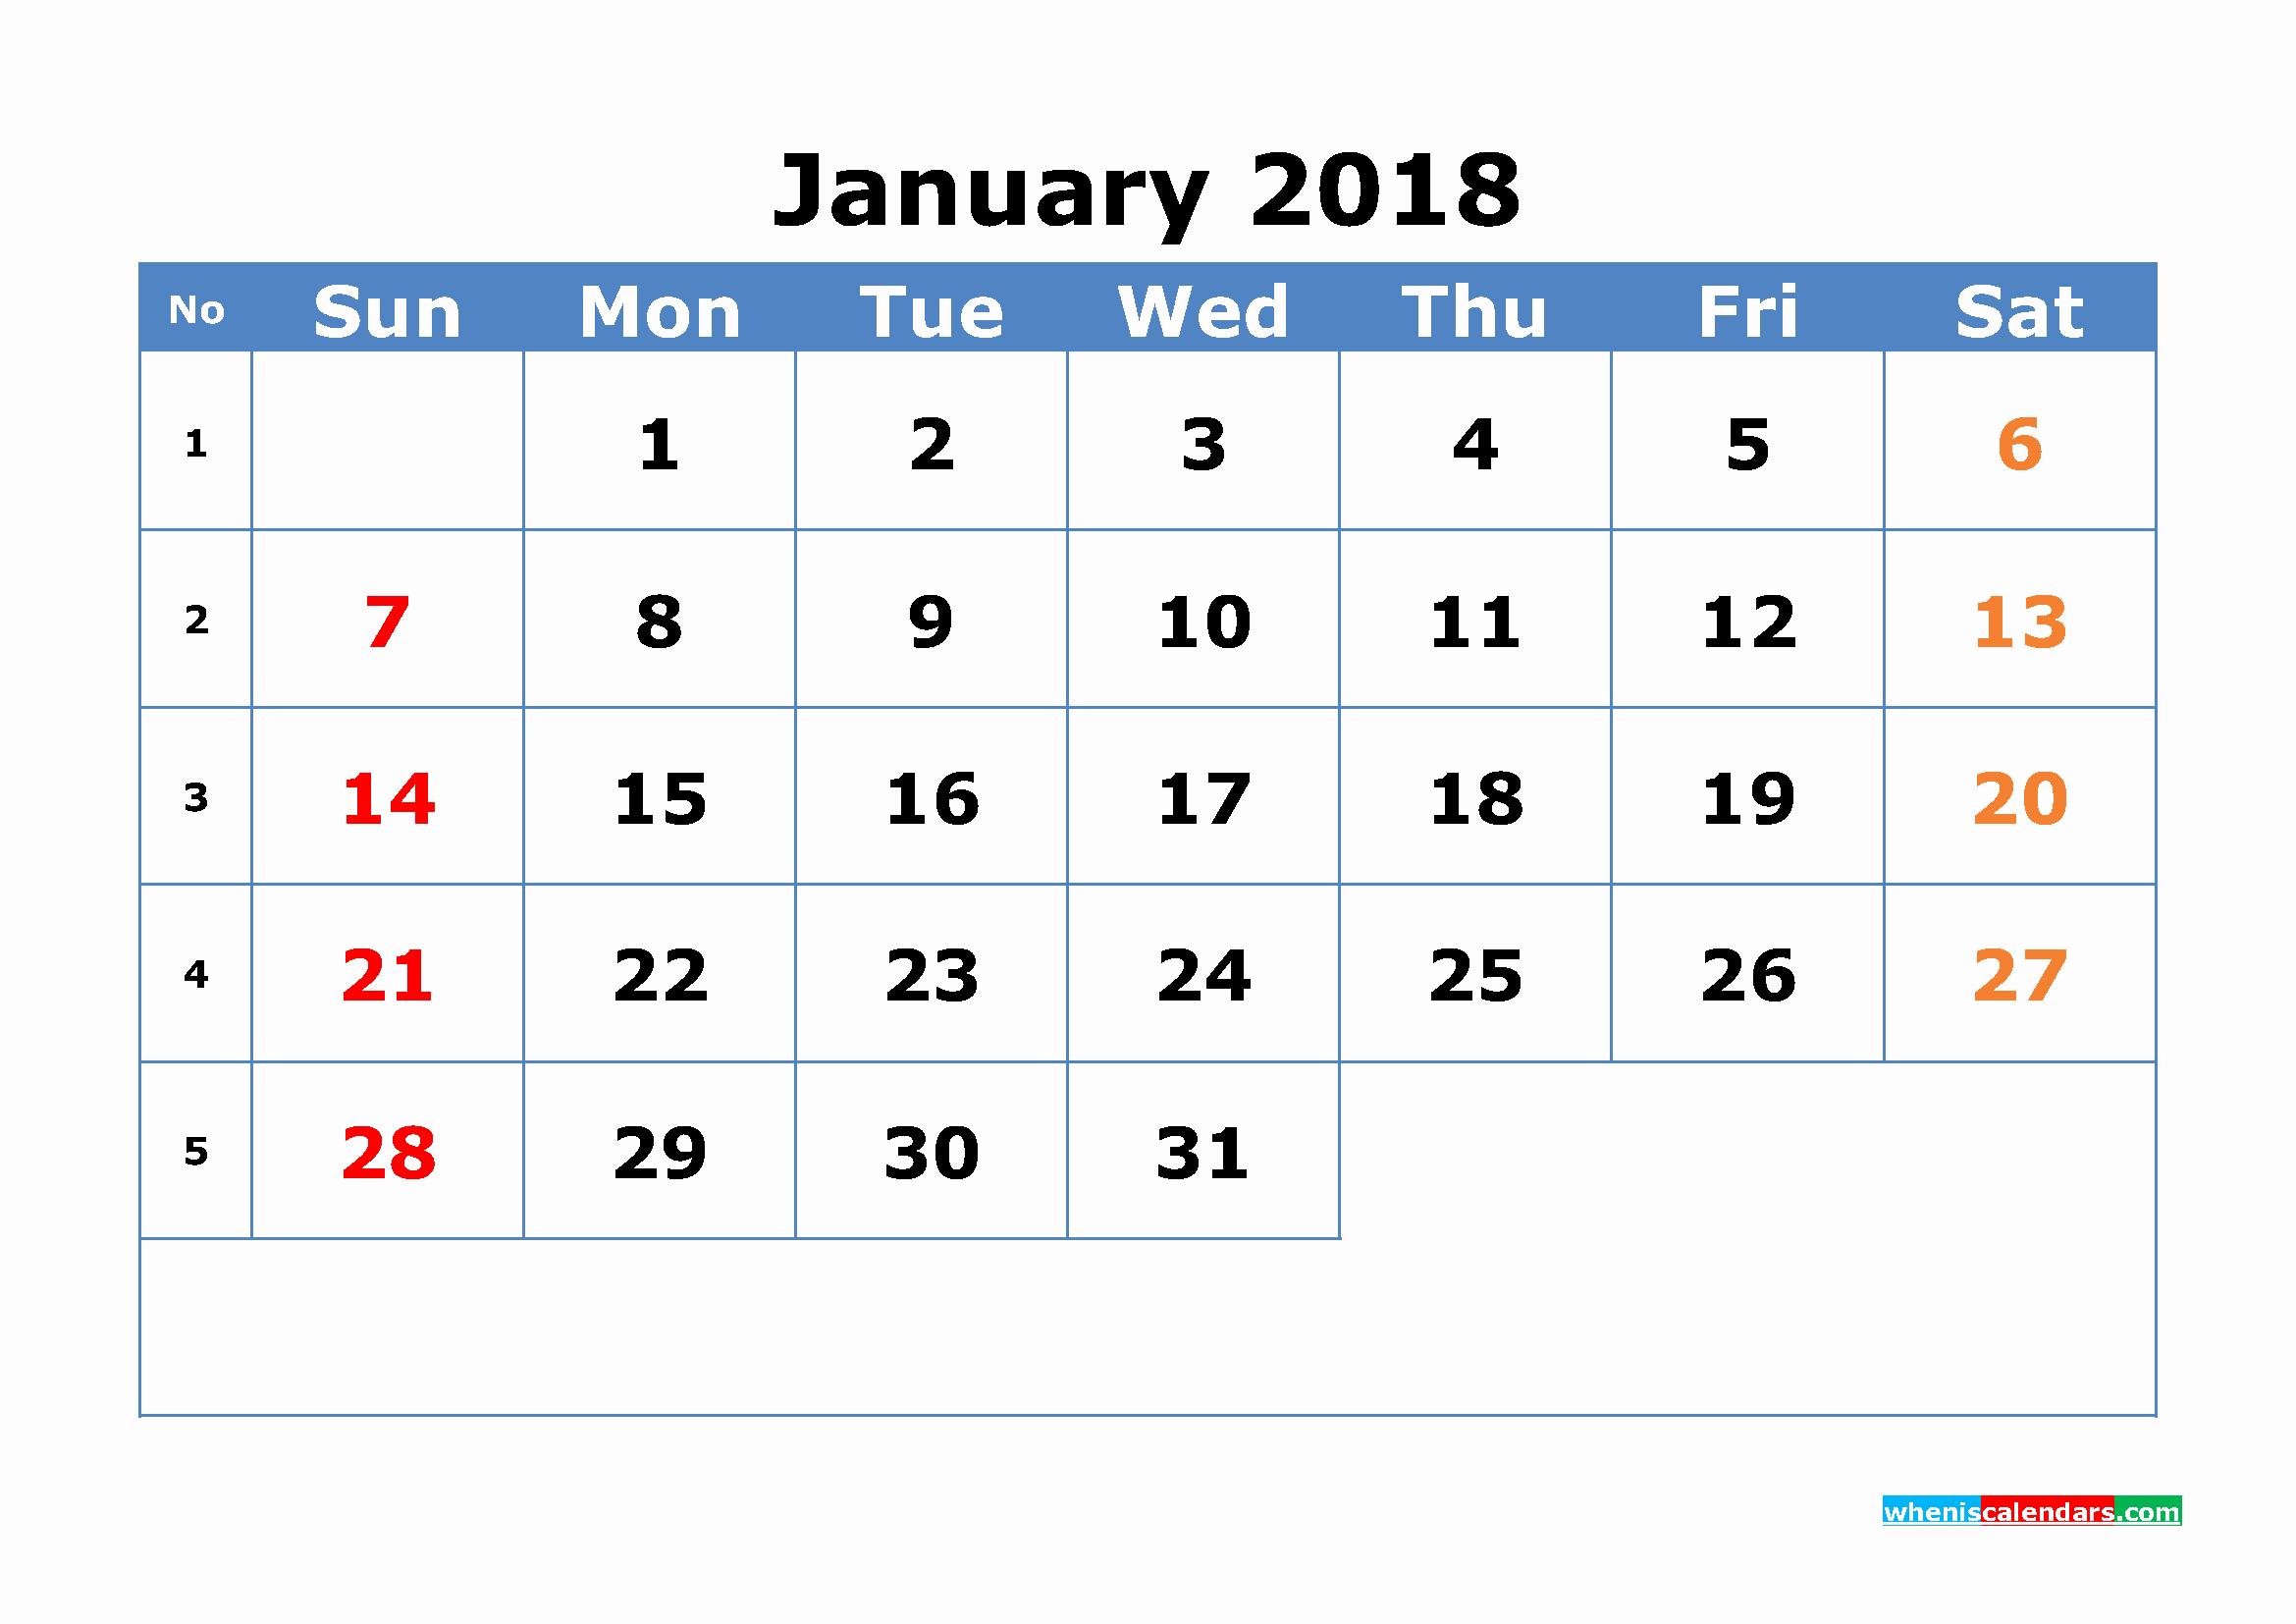 12 Month Printable Calendar 2018 Fresh 12 Month Calendar 2018 with Week Numbers Printable Pdf